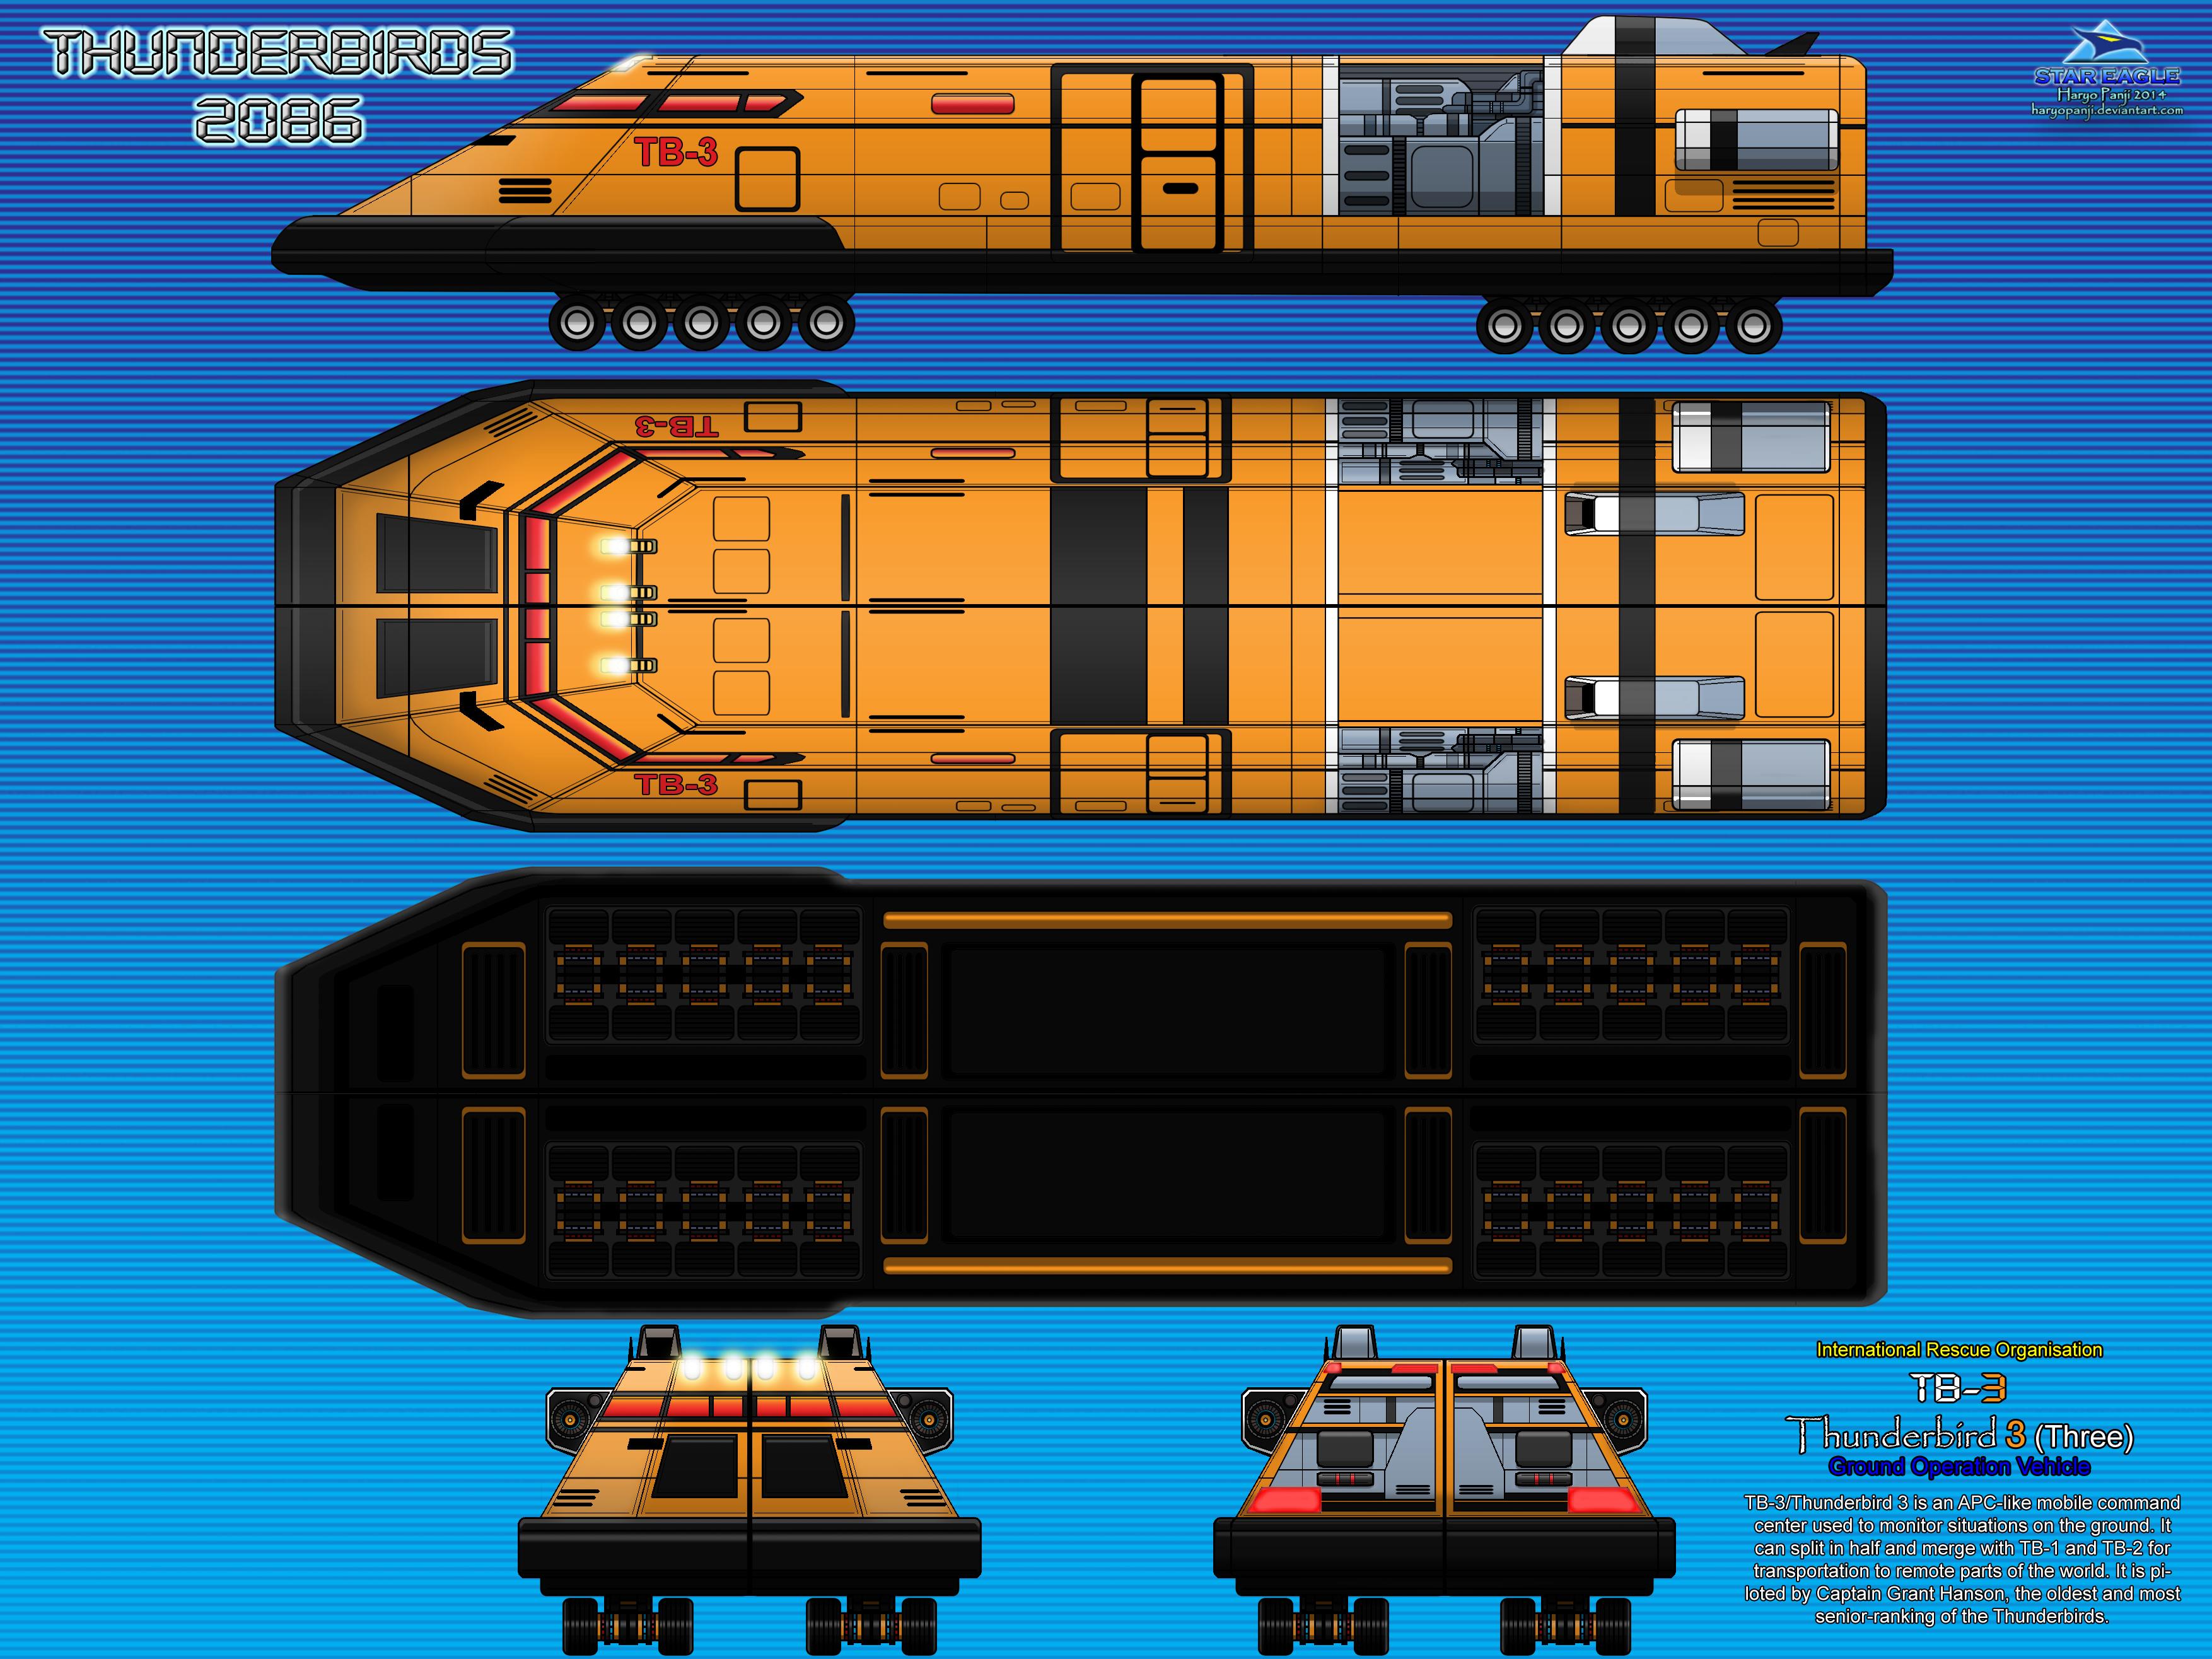 Thunderbird 3 (TB-3) Ground Operation Vehicle